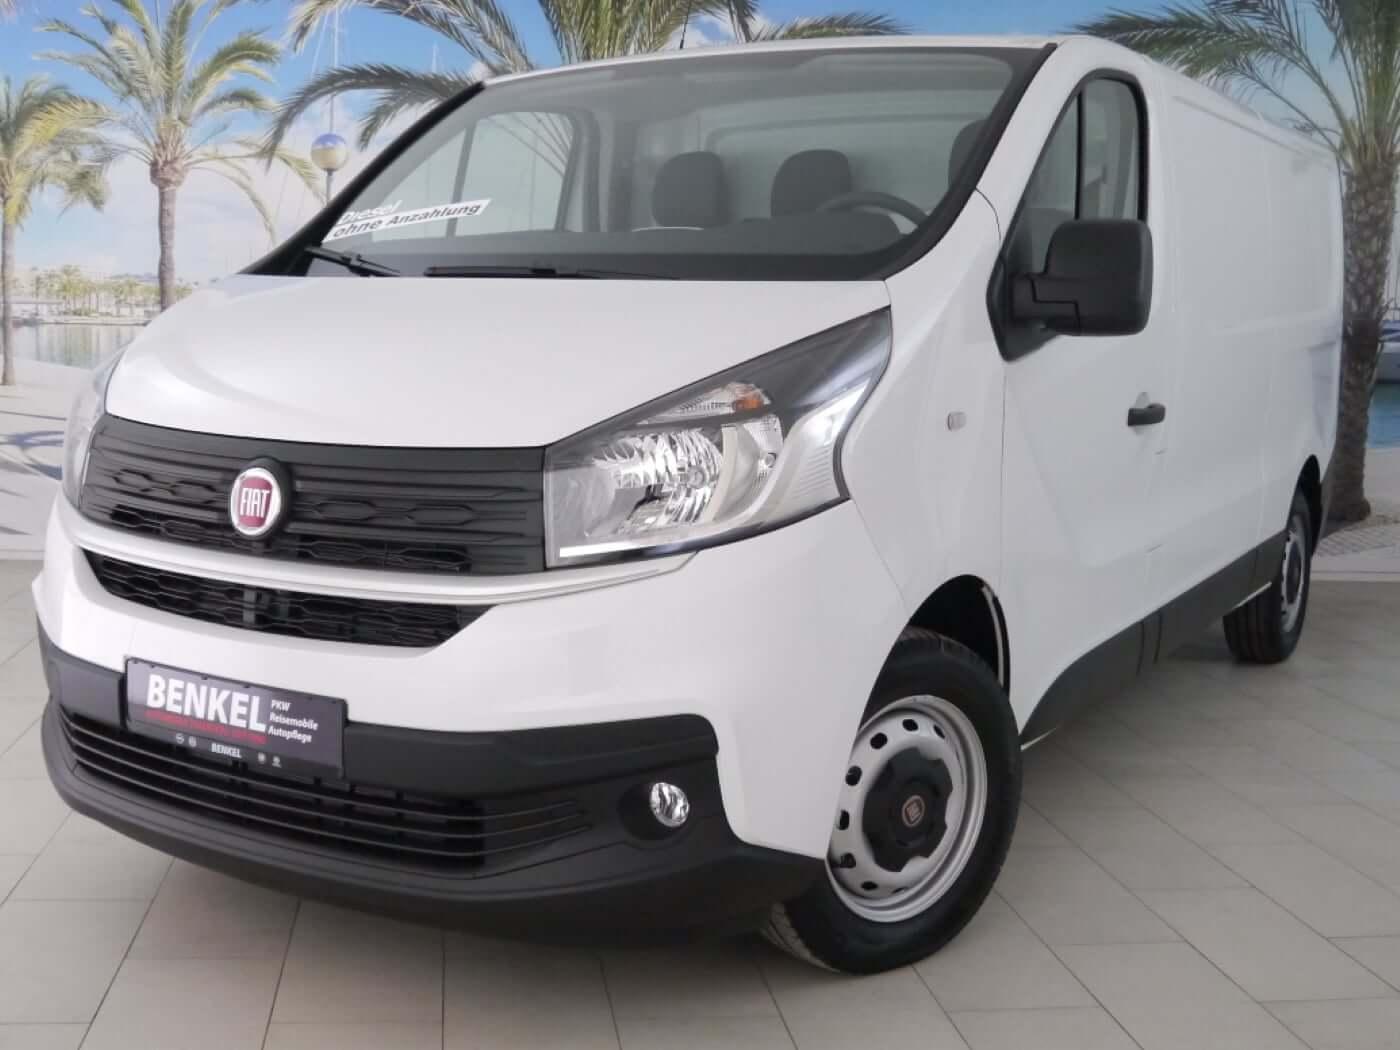 Fiat_Talento_Transporter